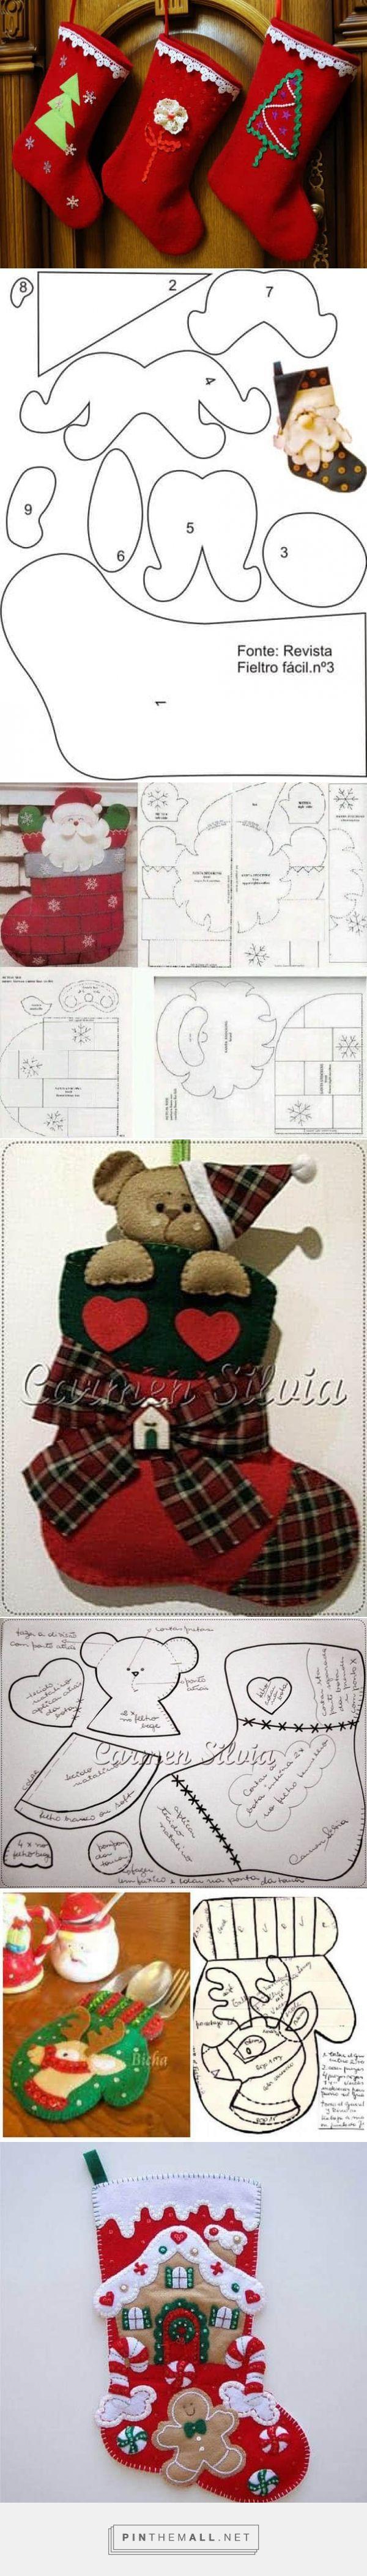 Moldes para hacer botas navideñas de fieltro gratis... - a grouped images picture - Pin Them All